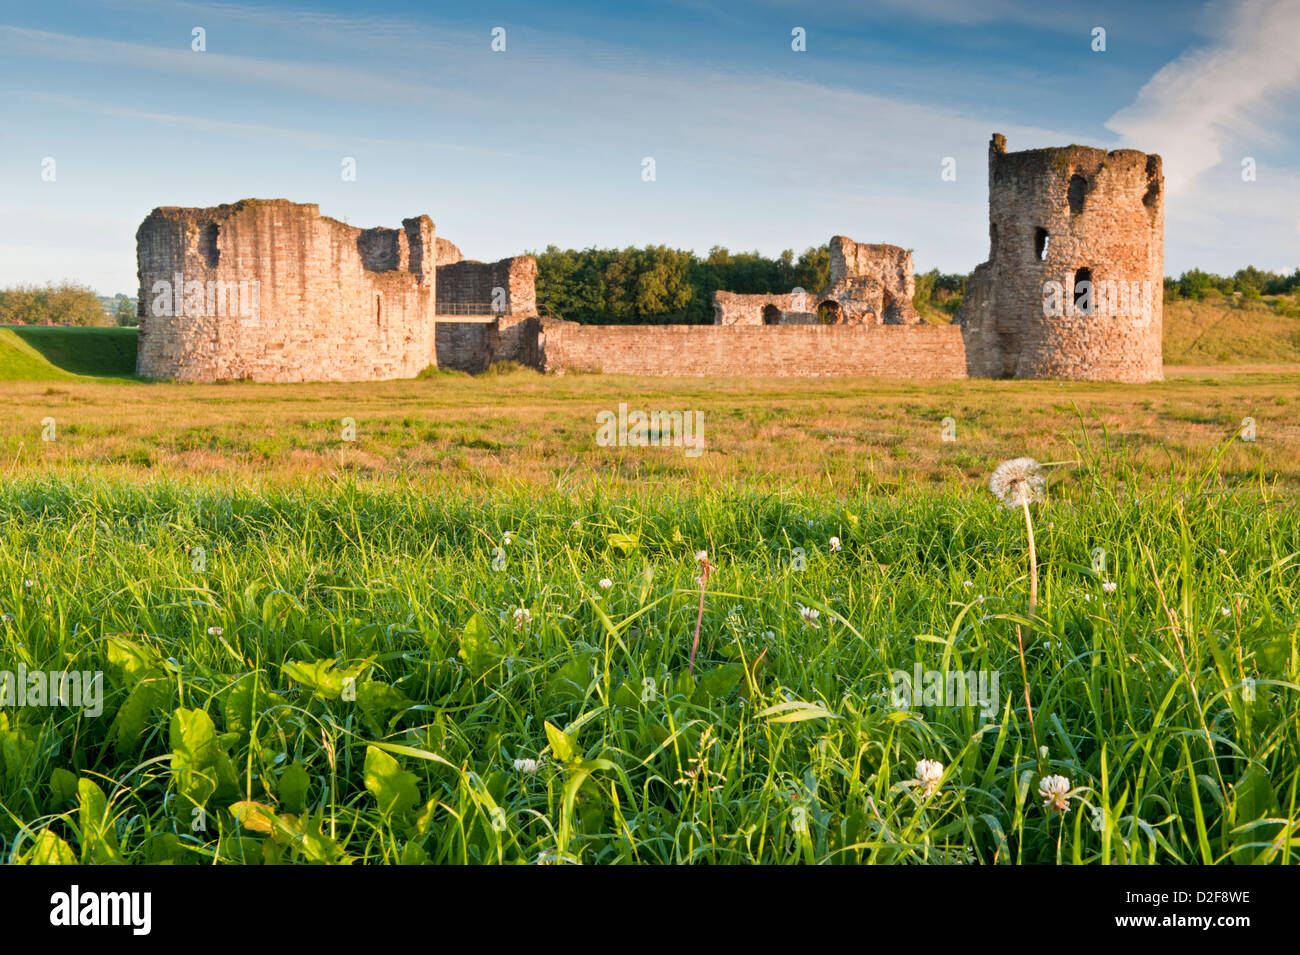 Flint Castle, Flint, Flintshire, North Wales, UK - Stock Image